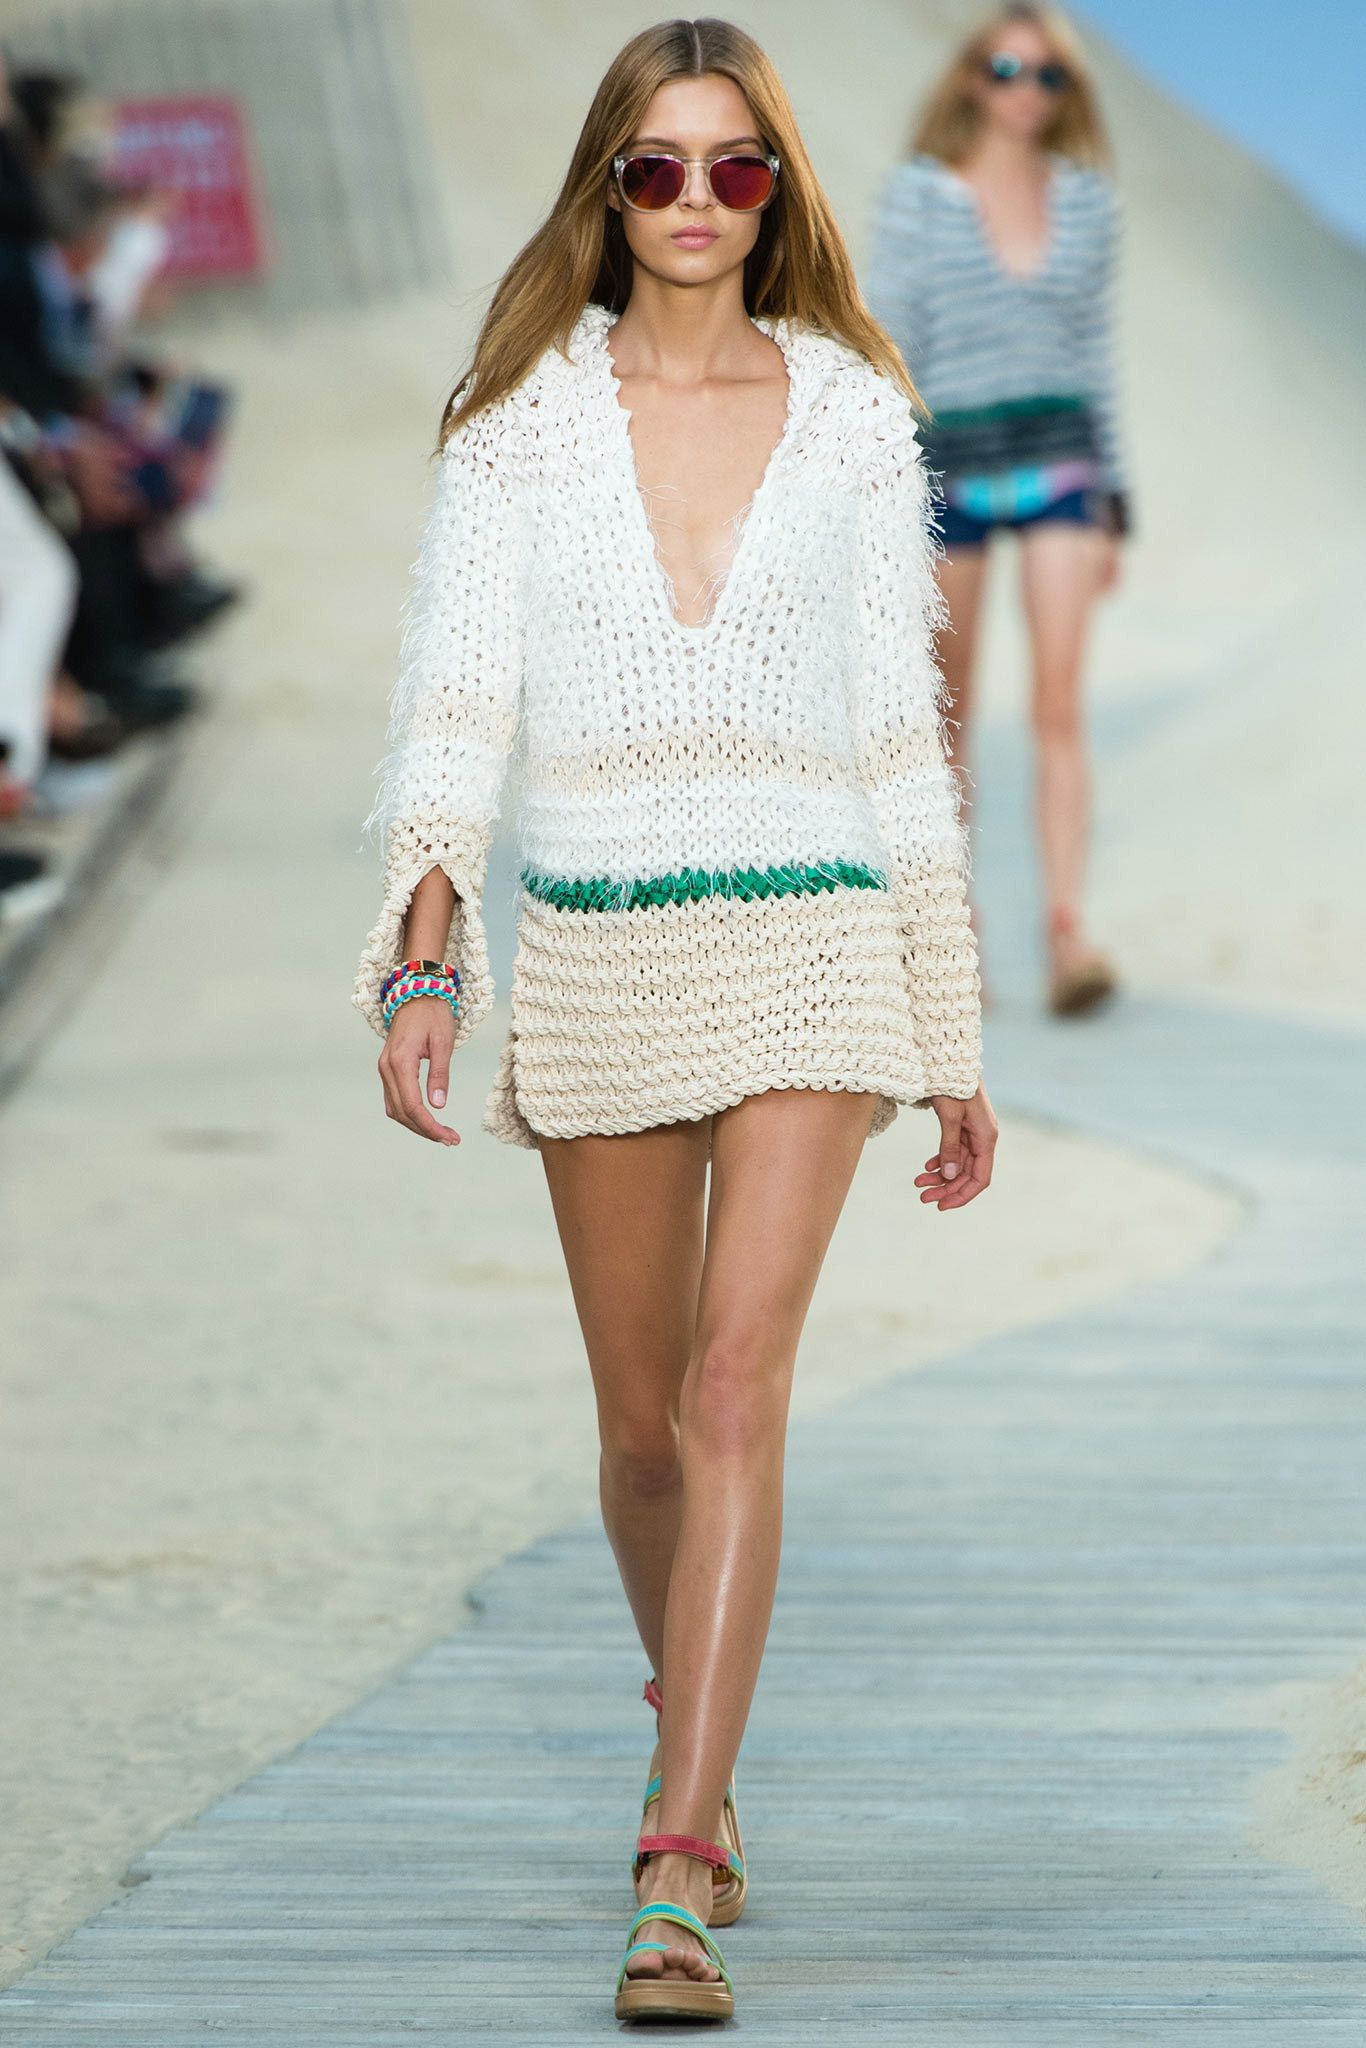 1a6878c27a9732 Tommy Hilfiger Spring 2014 Ready-to-Wear Fashion Show